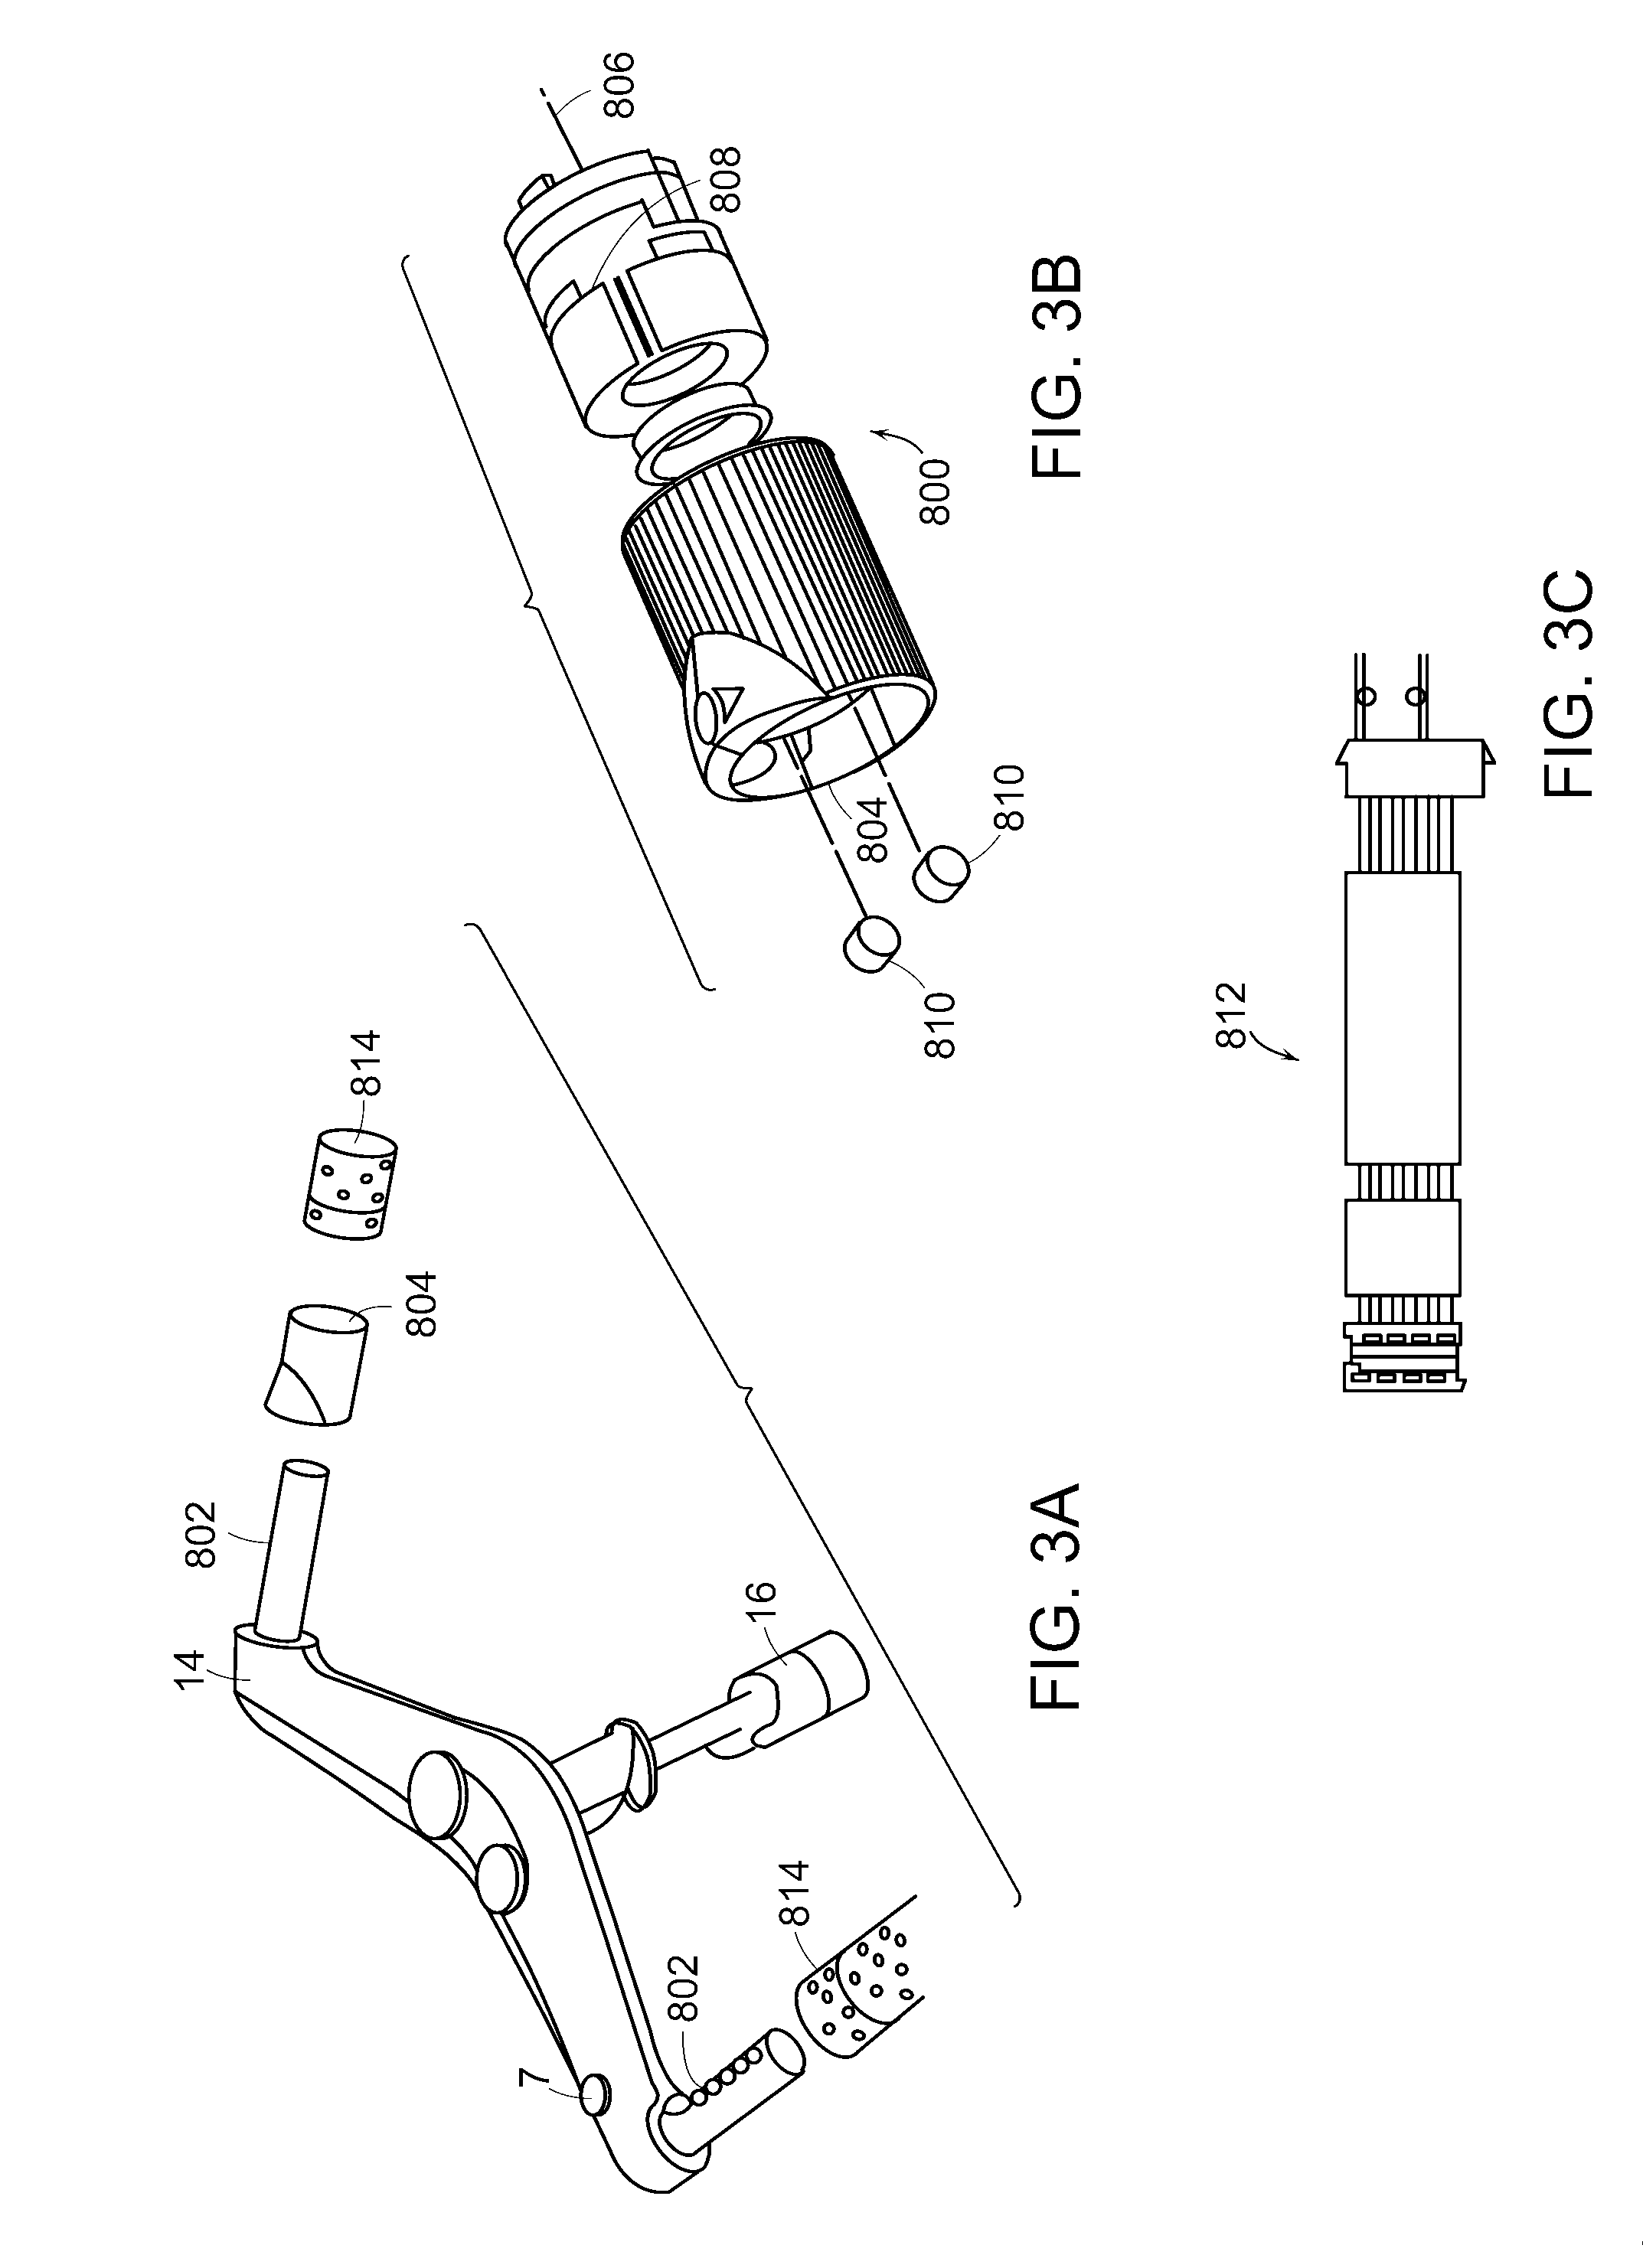 Patent US 9,400,502 B2